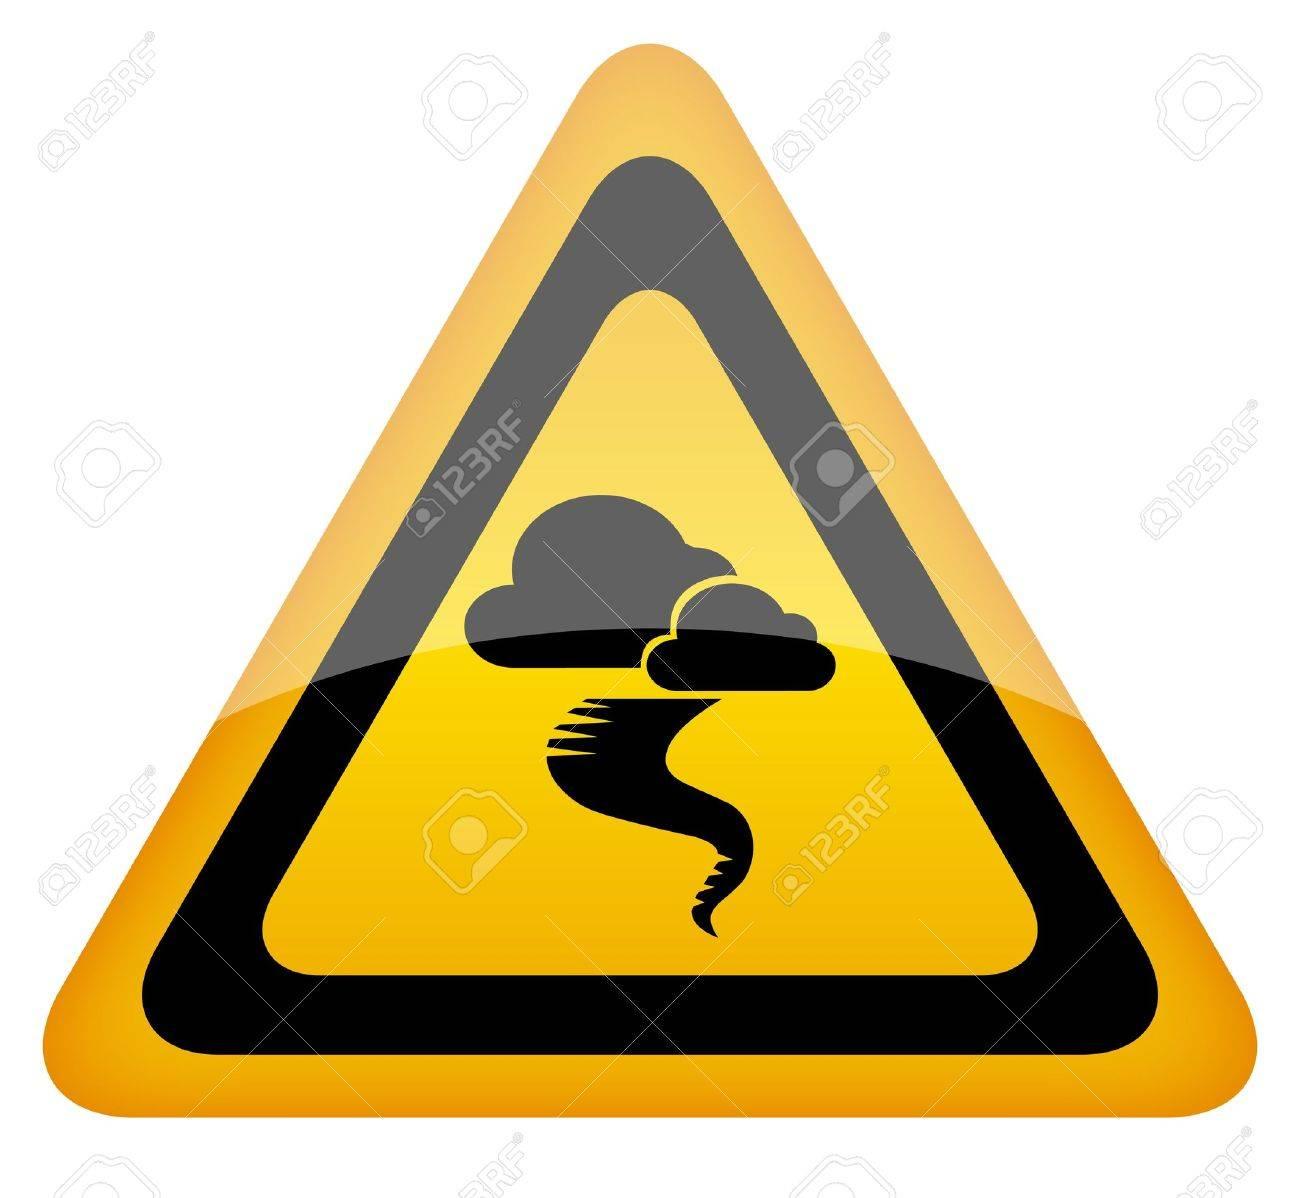 Hurricane warning sign, vector illustration Stock Vector - 12414746